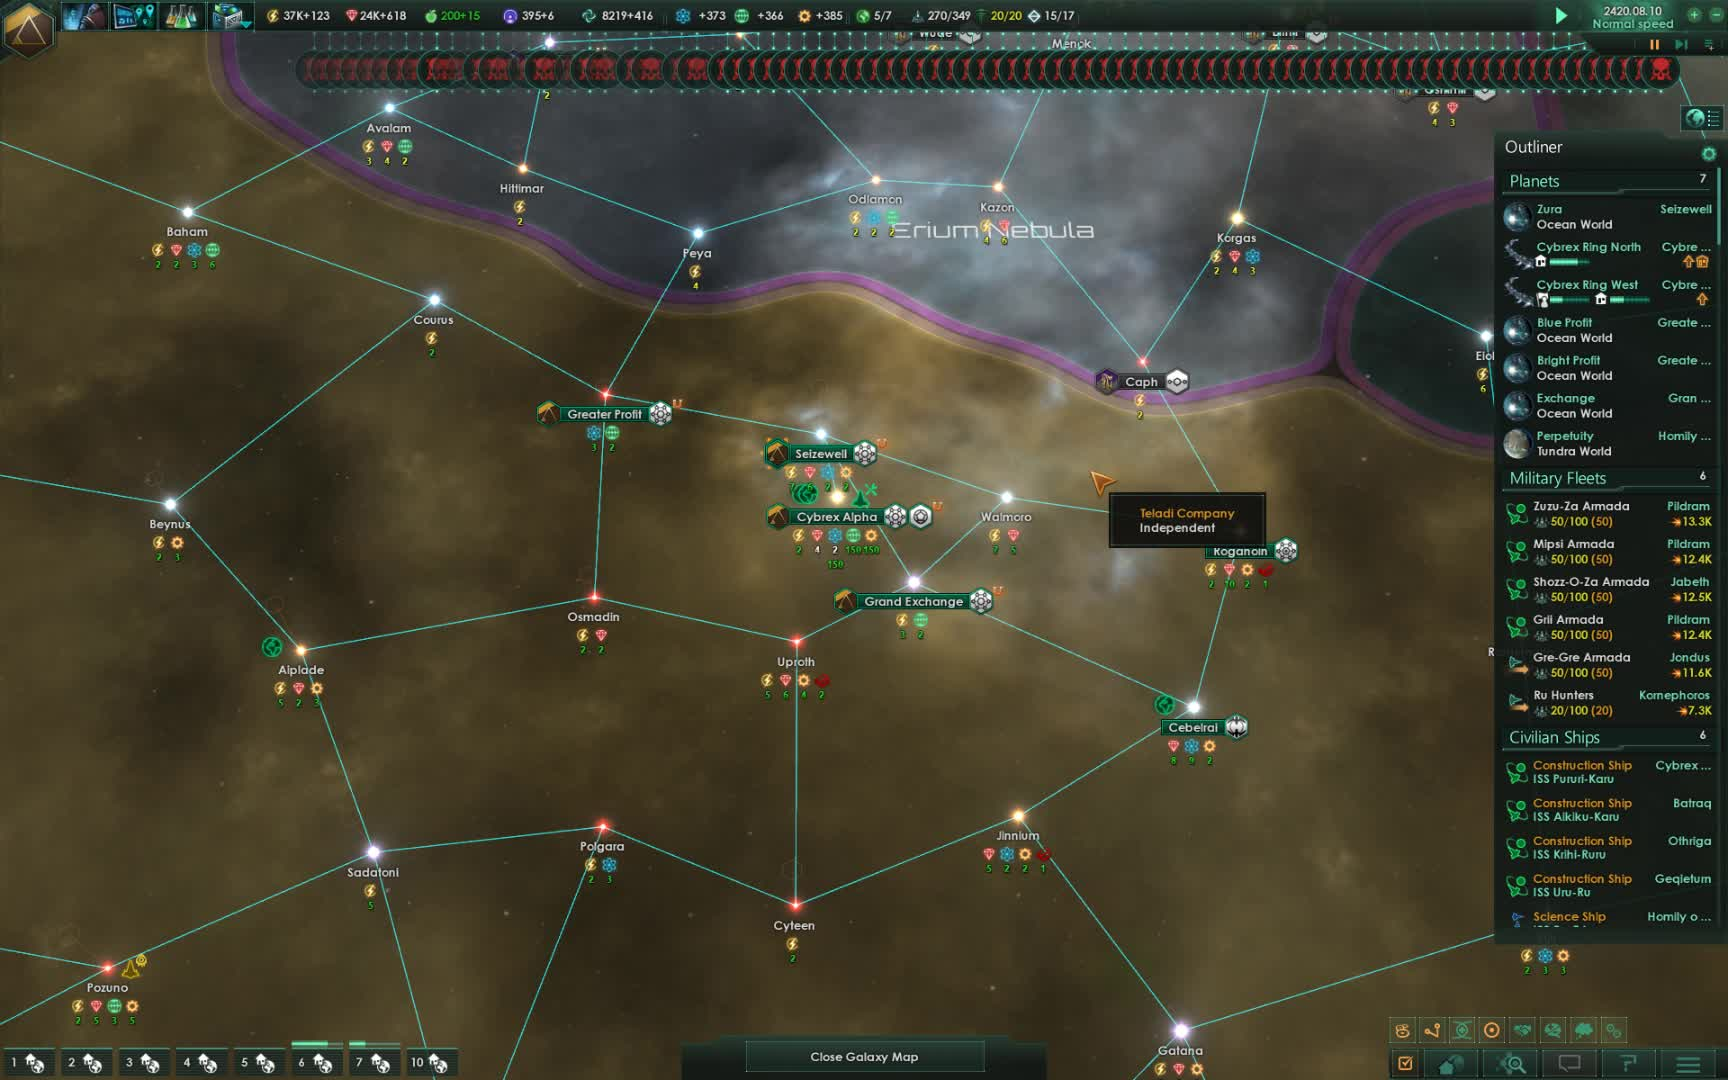 rocketleague, Stellaris 03.01.2018 - 19.20.51.01 GIFs